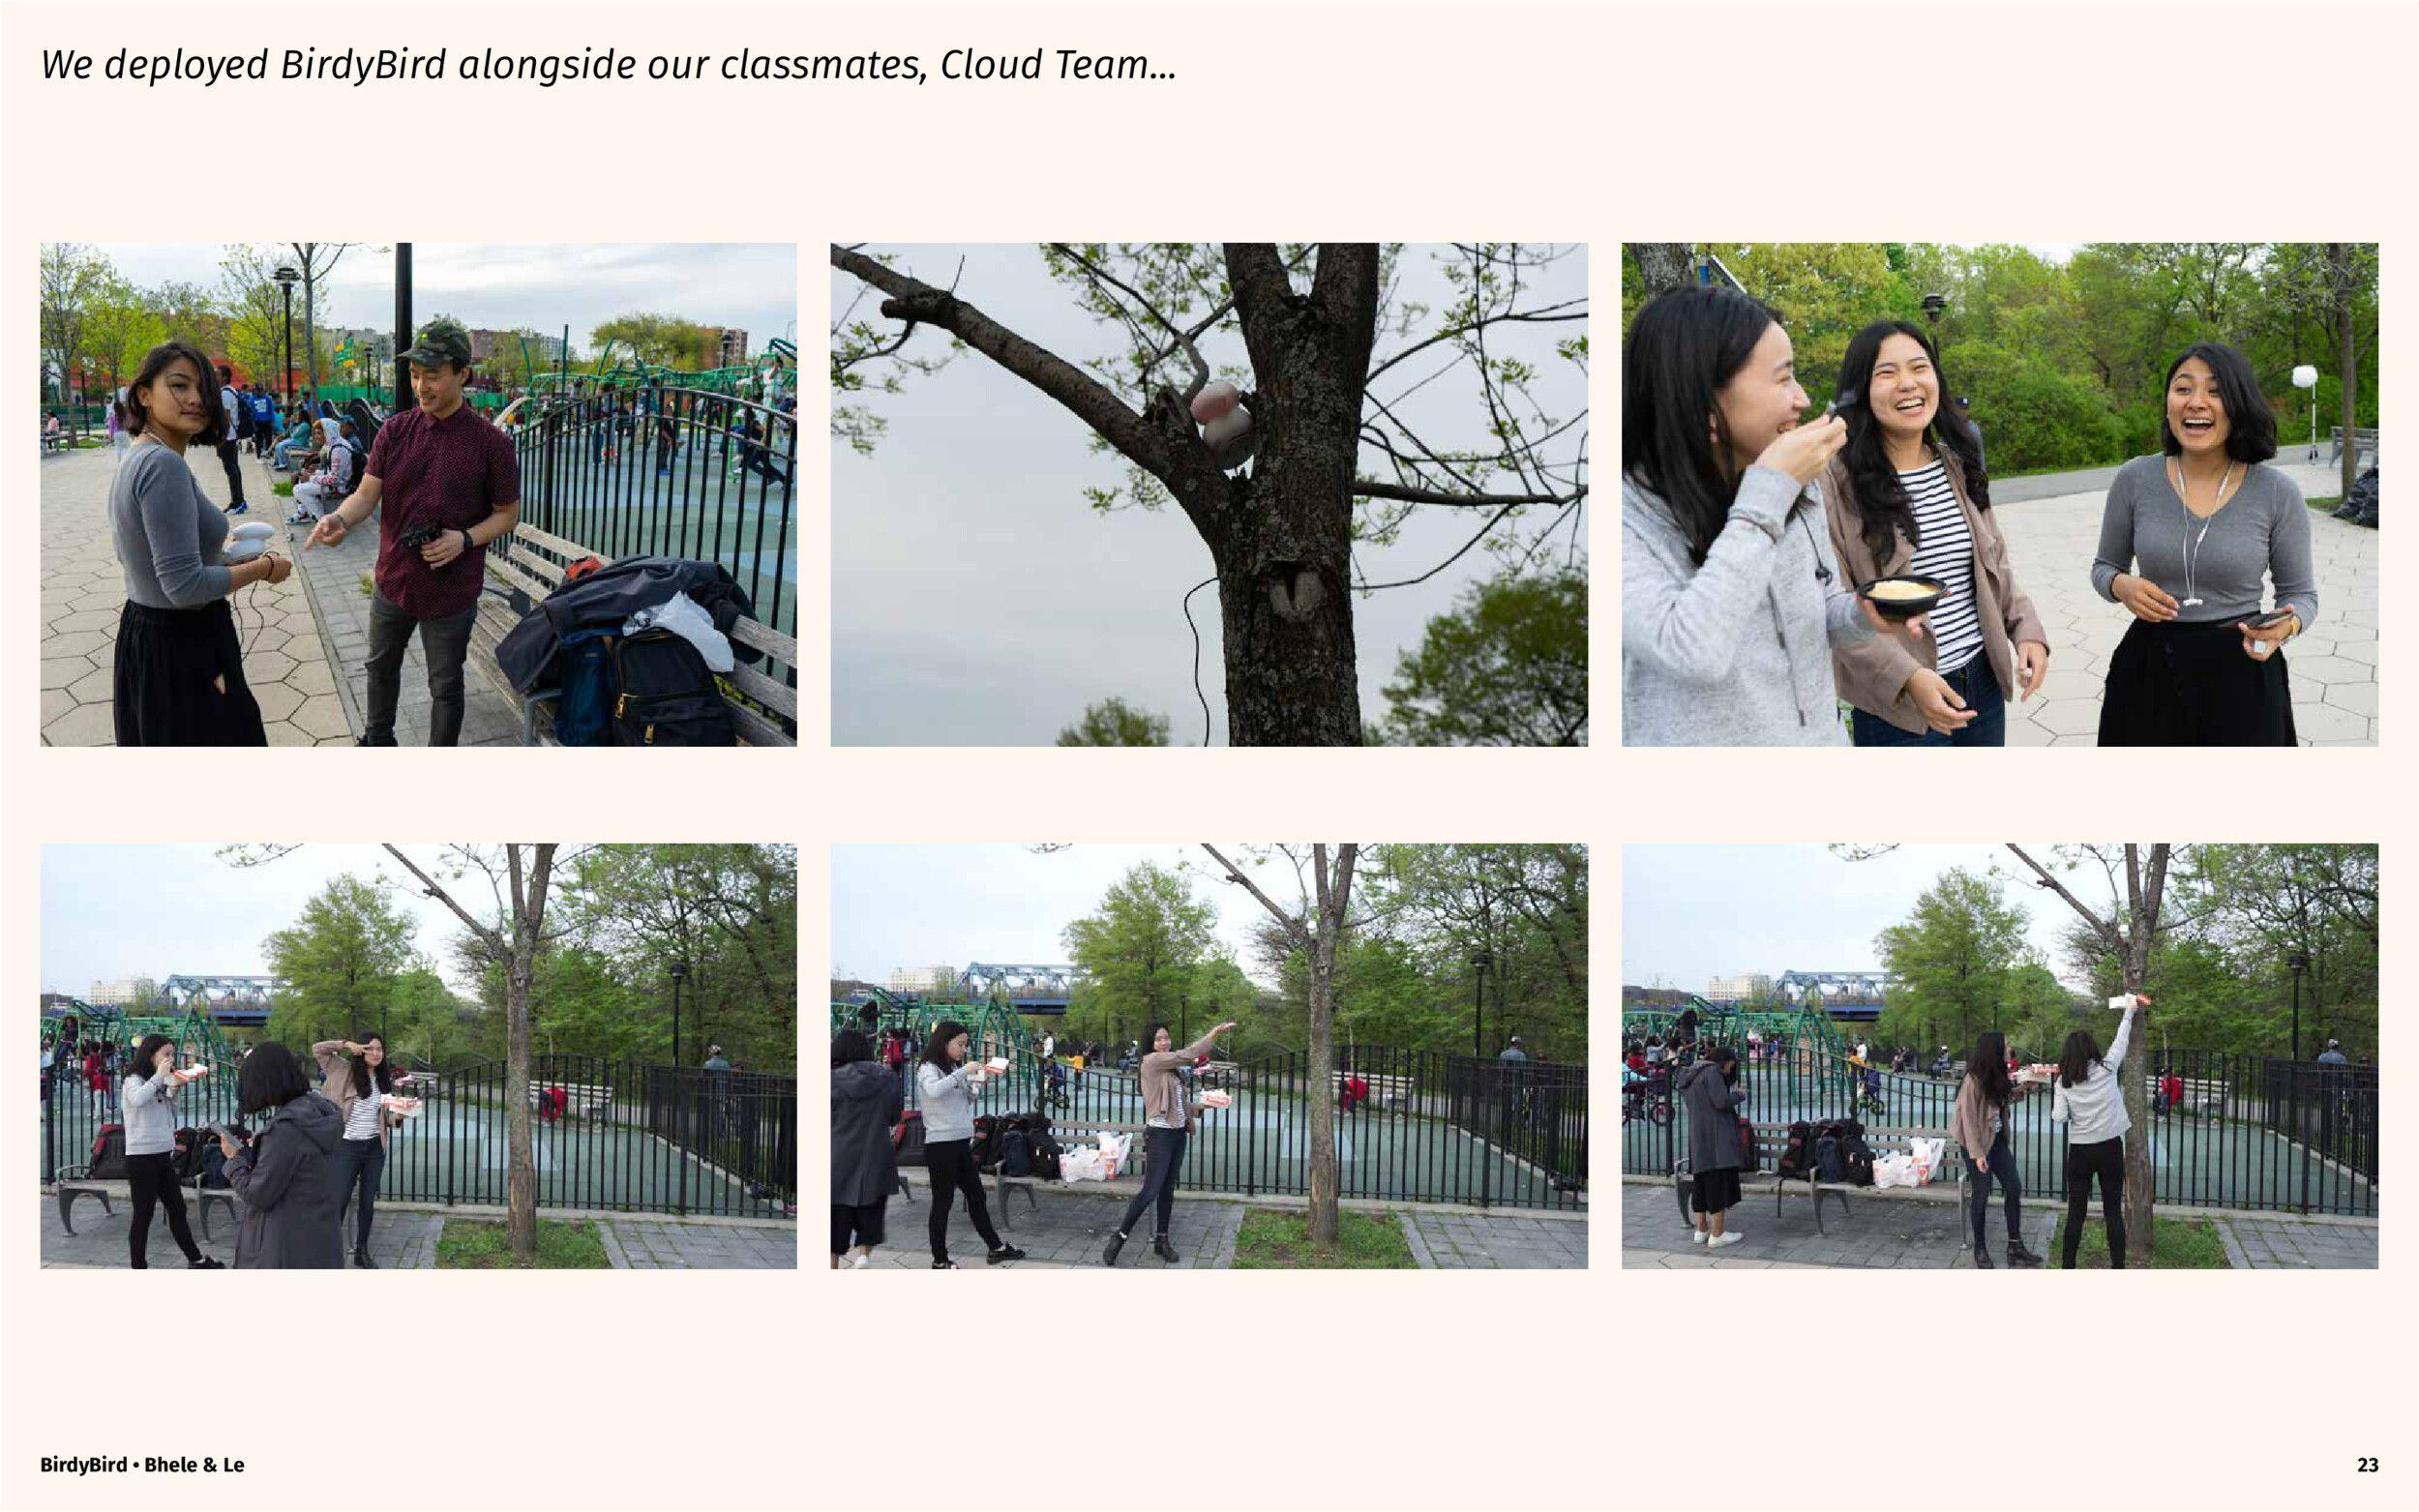 Enjoying the park with our classmates and BirdyBird.